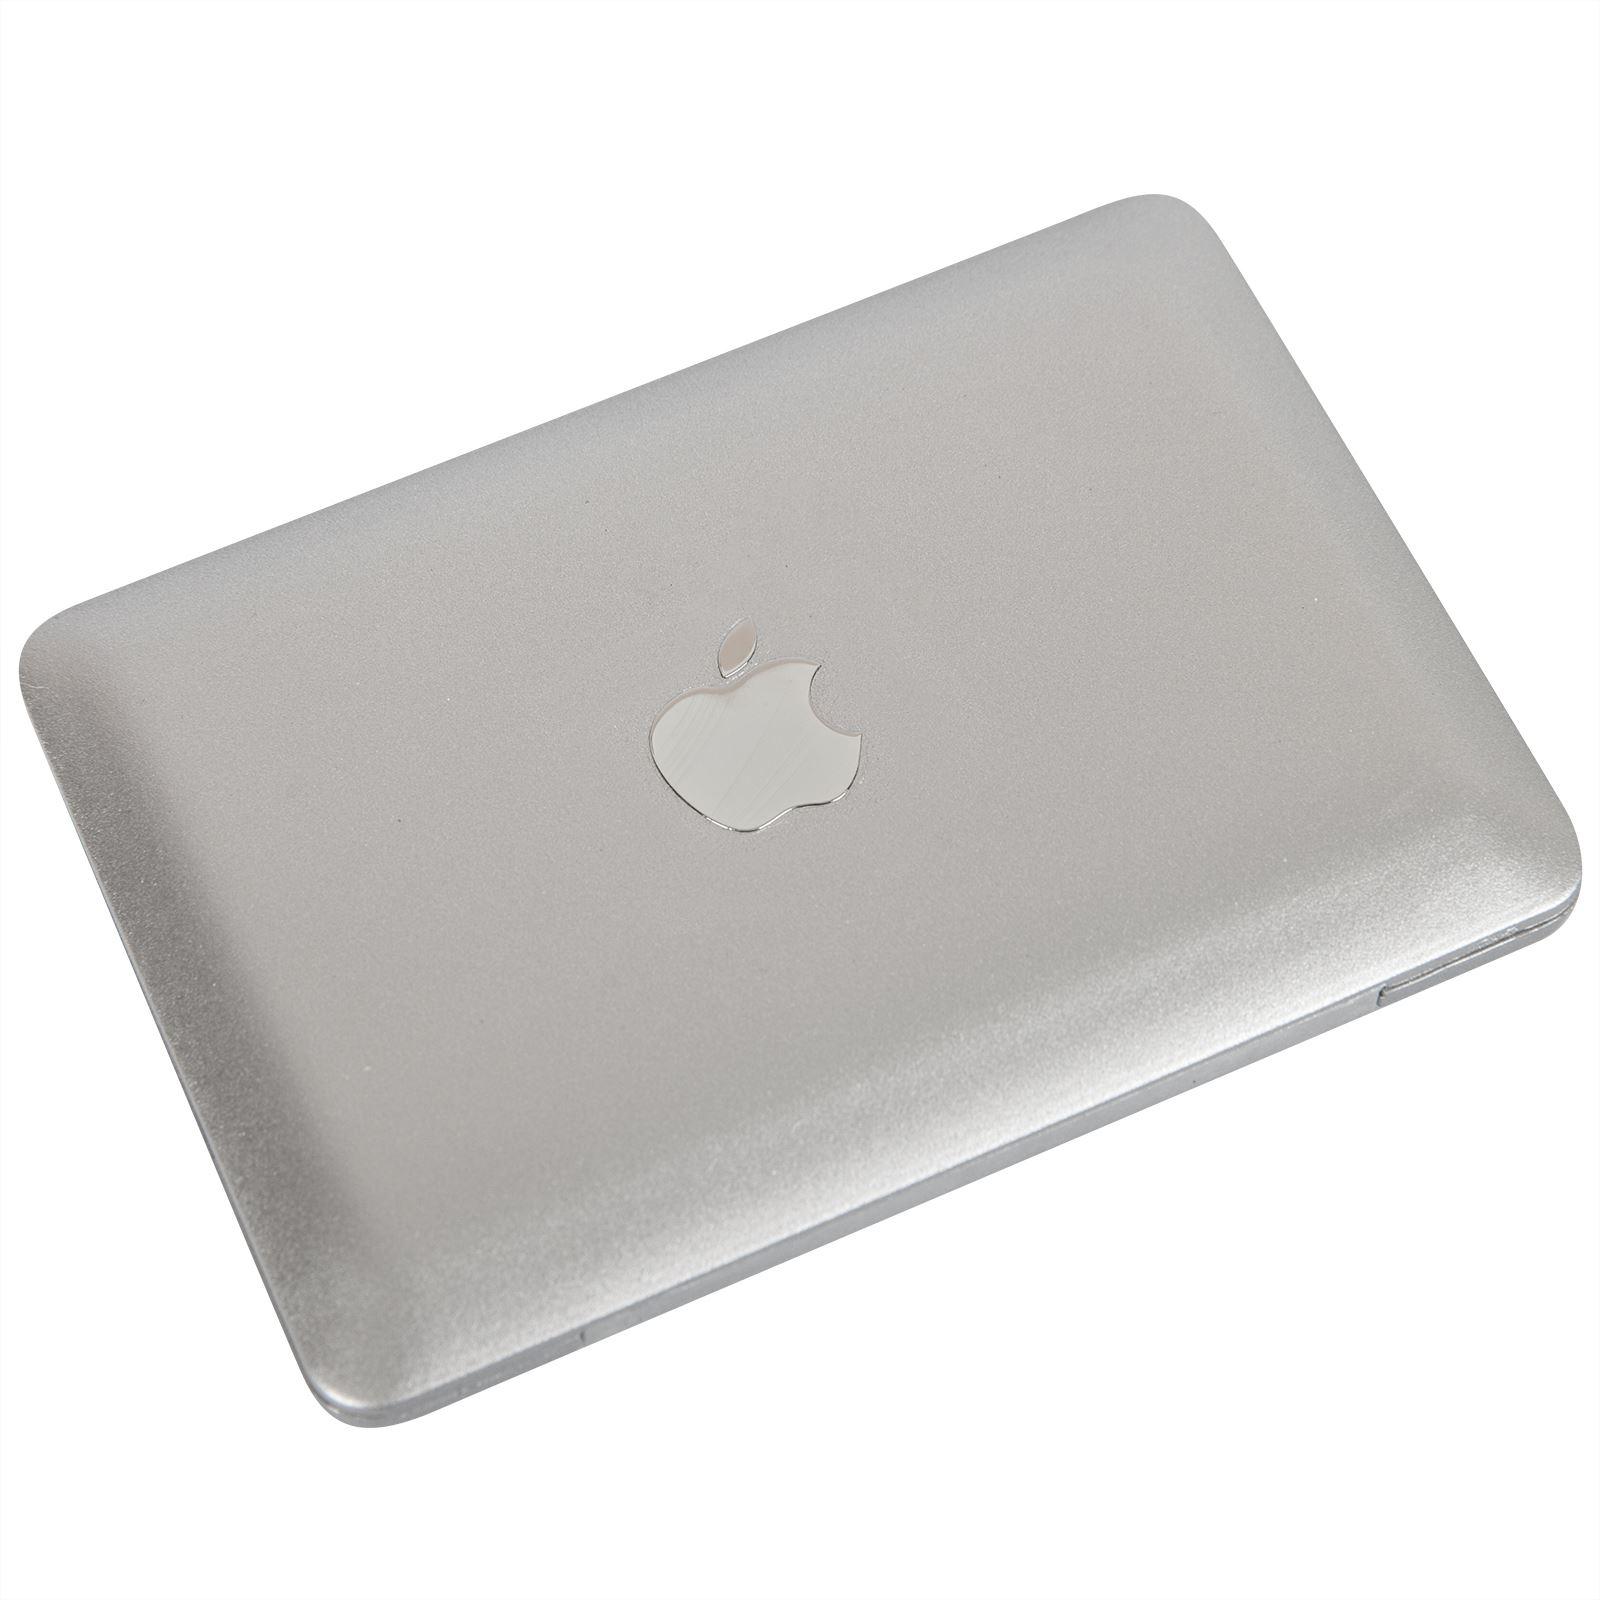 mac book air design portable compact pocket mini make up cosmetic mirror ebay. Black Bedroom Furniture Sets. Home Design Ideas